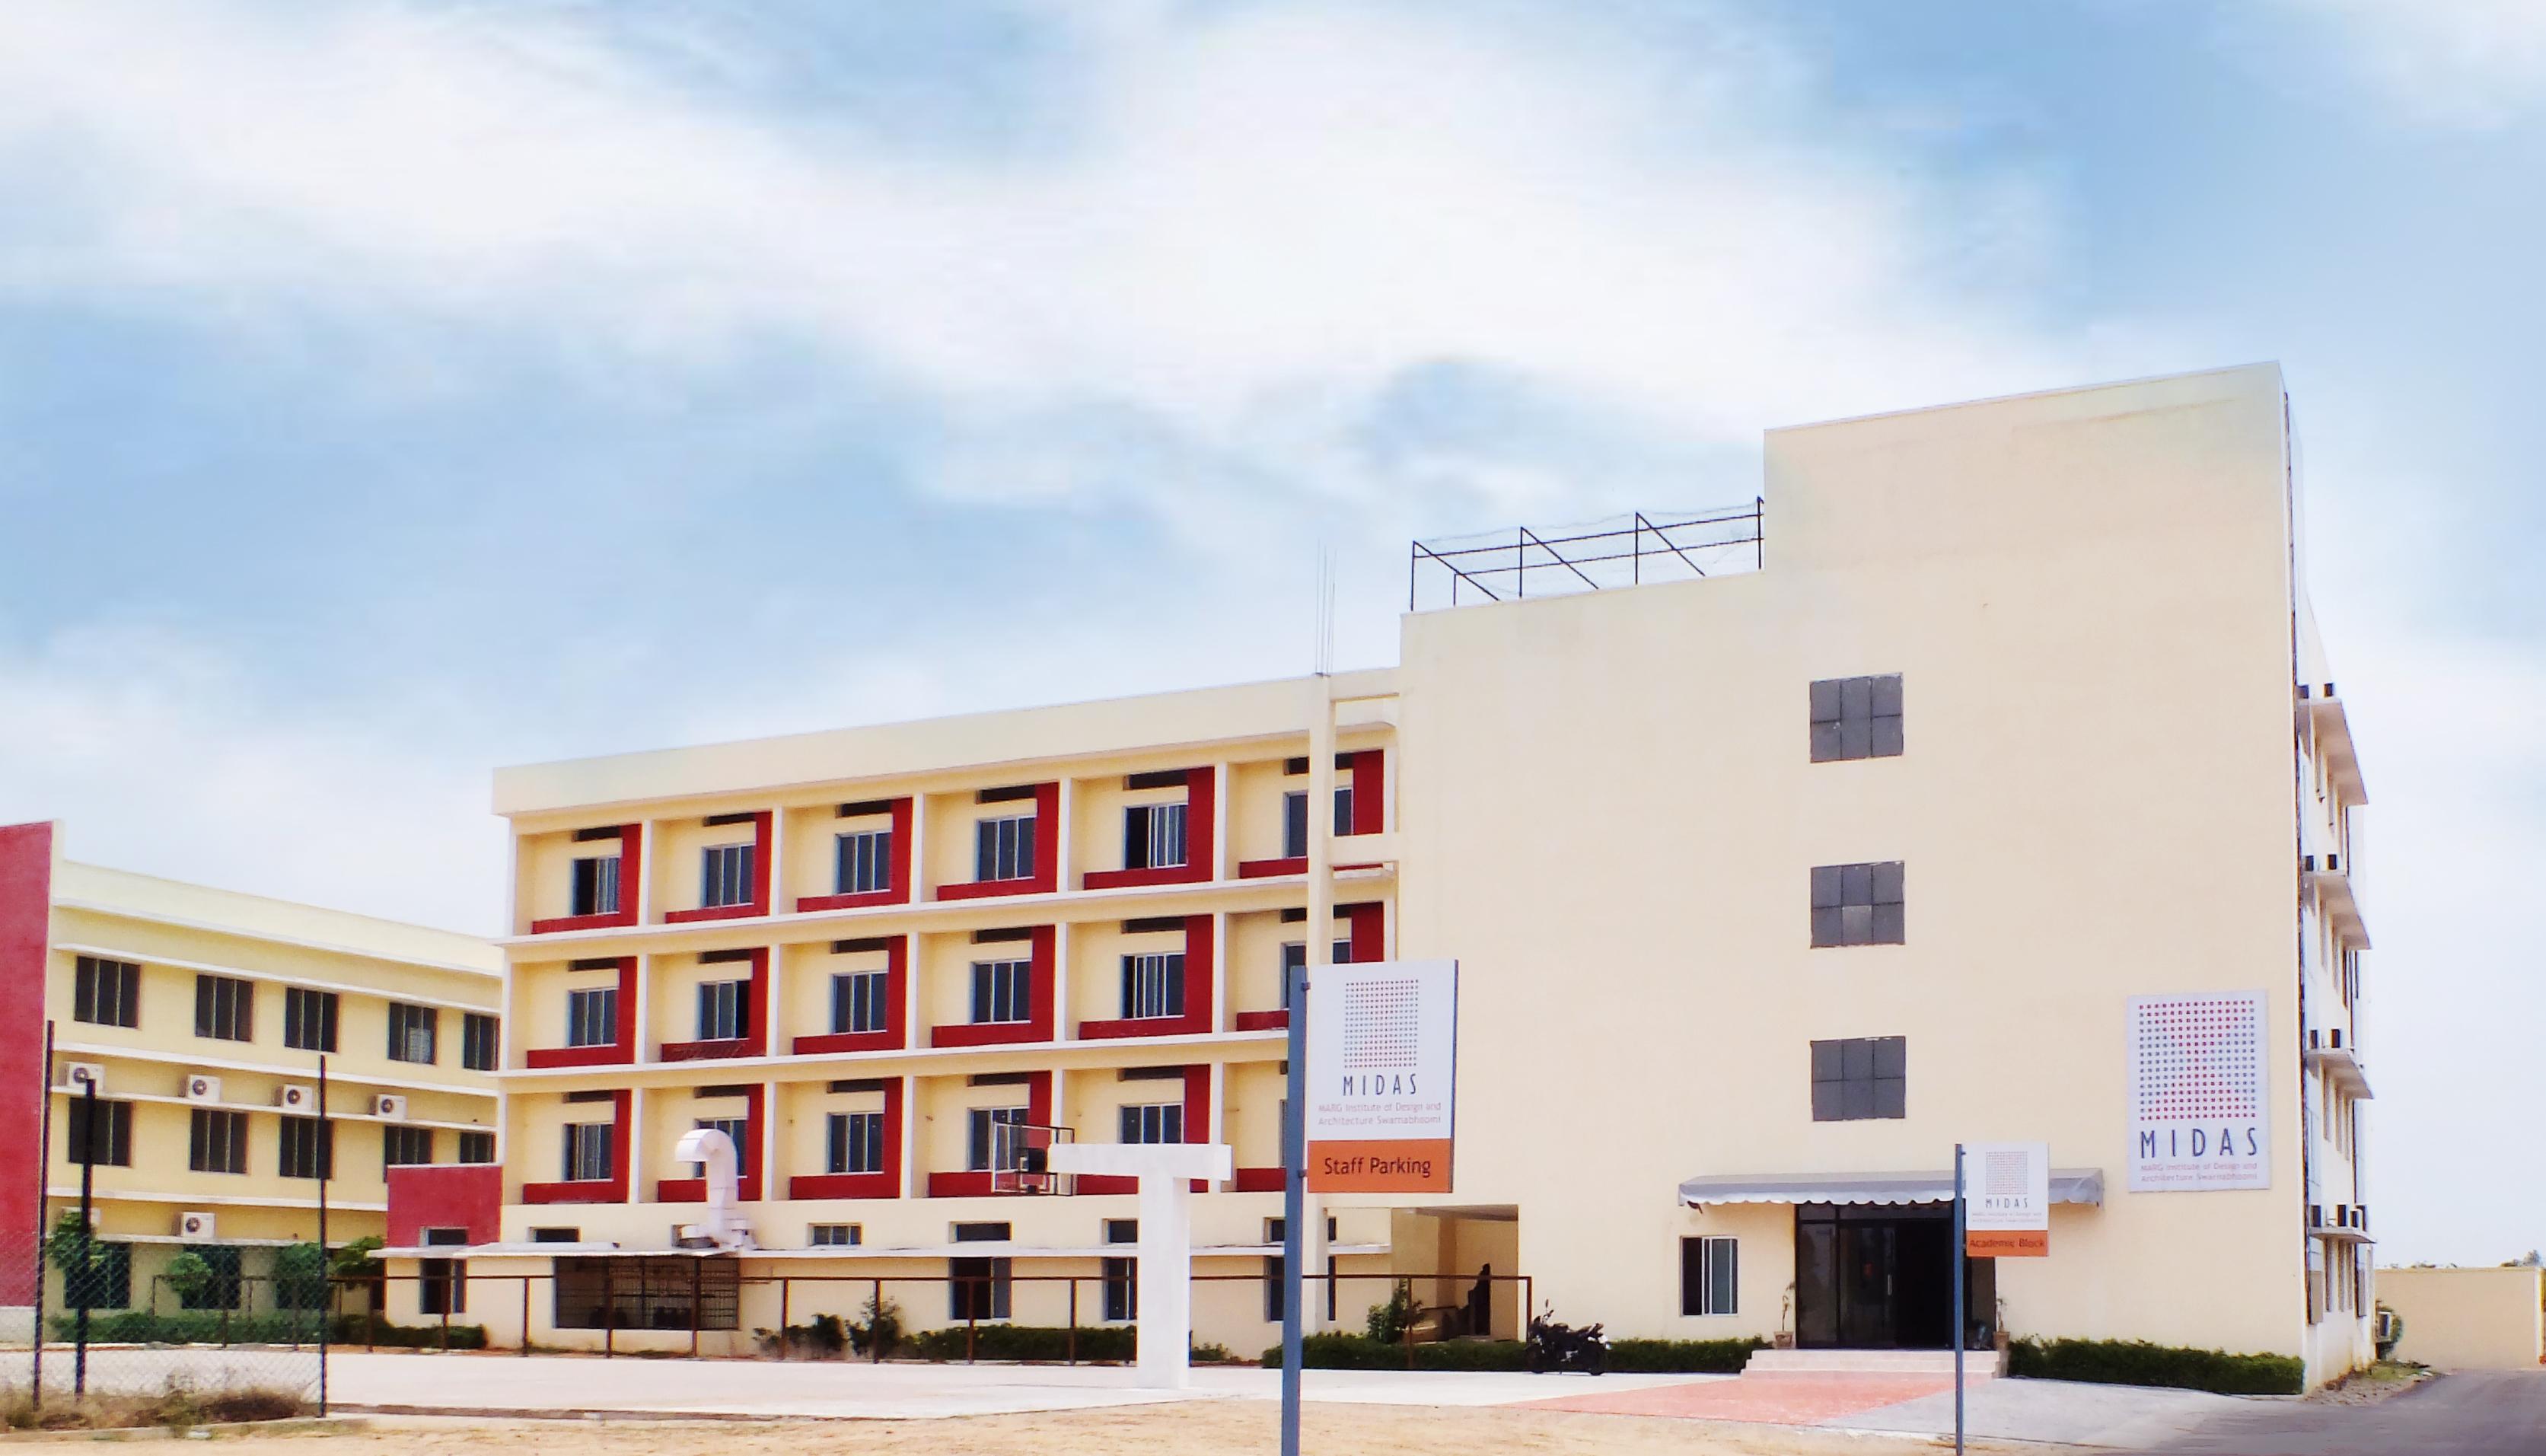 marg institute of design architecture swarnabhoomi midas marg